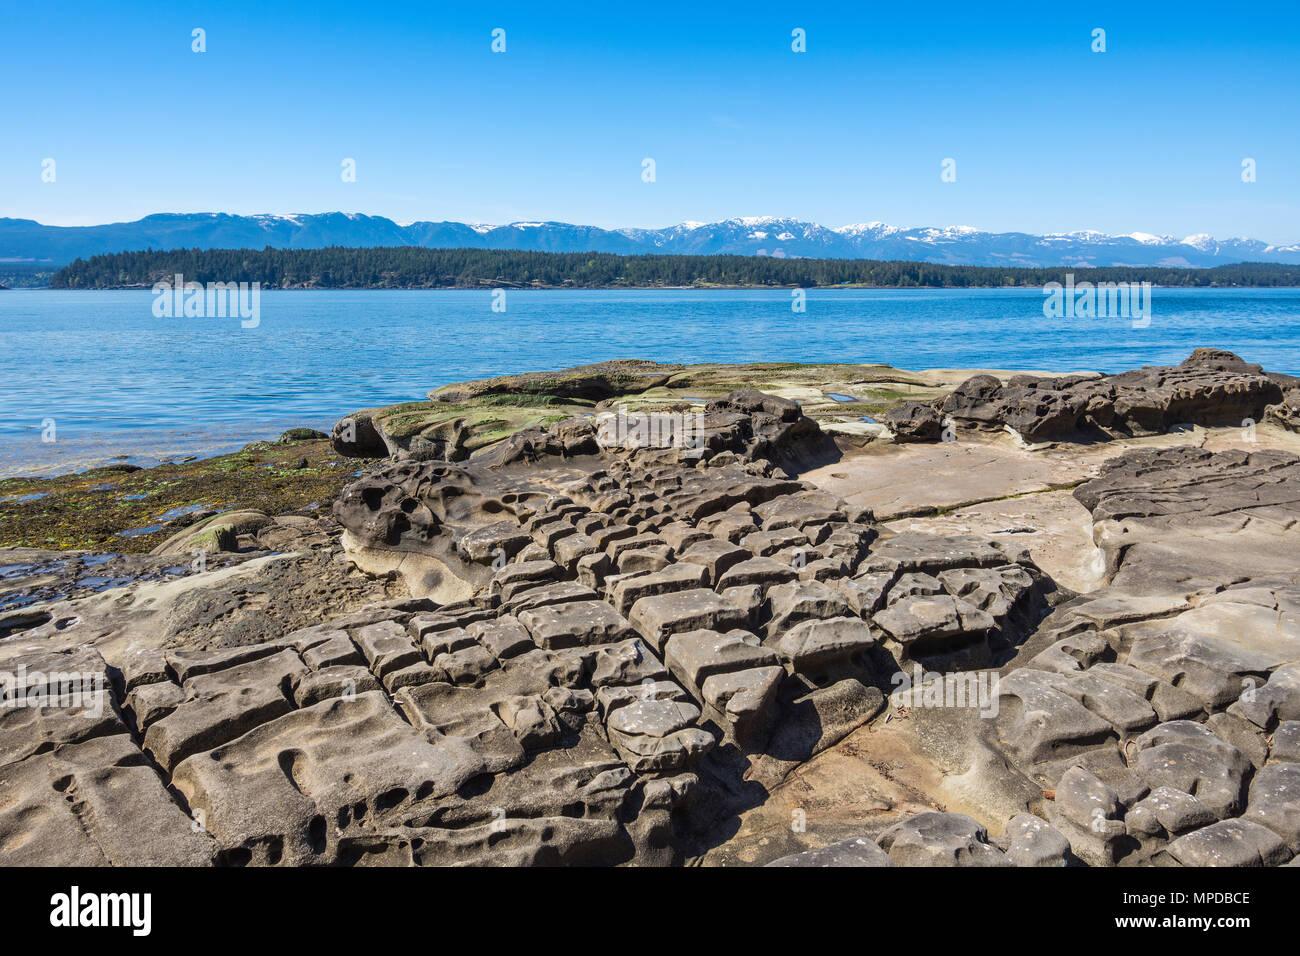 Rocky coastline, Hornby Island, BC, Canada. - Stock Image